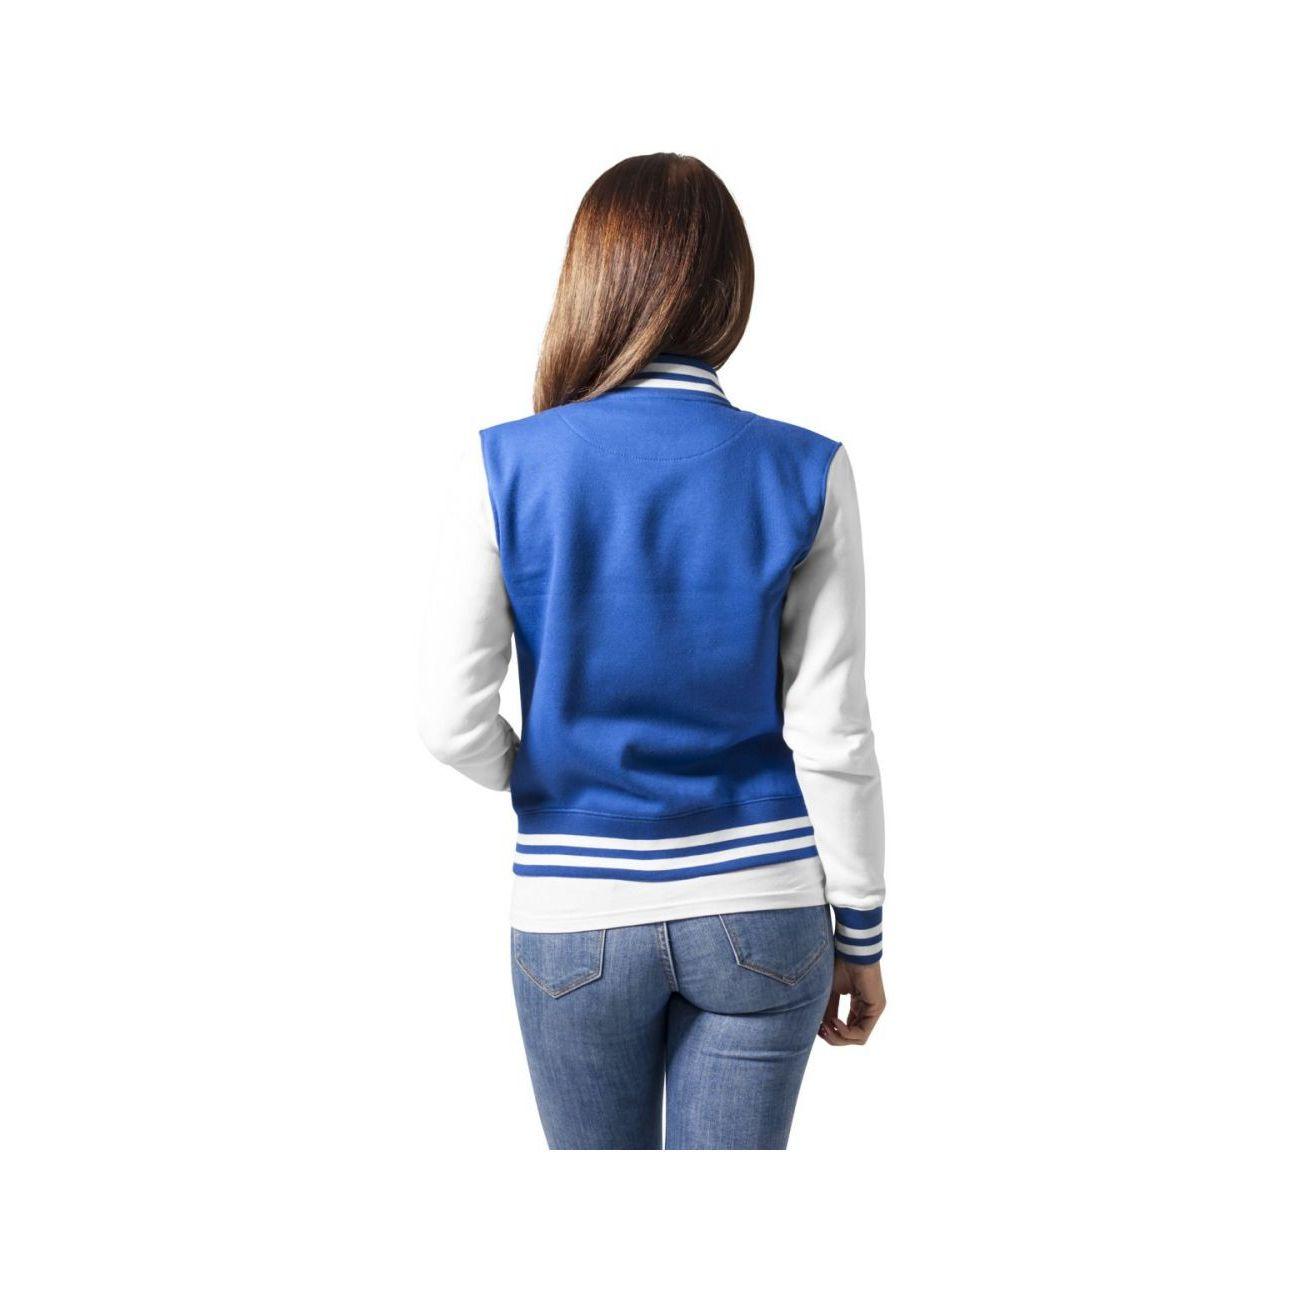 Teddy Achat Blanc Roi – Urban Classics Veste College Bleu Ladies nm8vwN0O